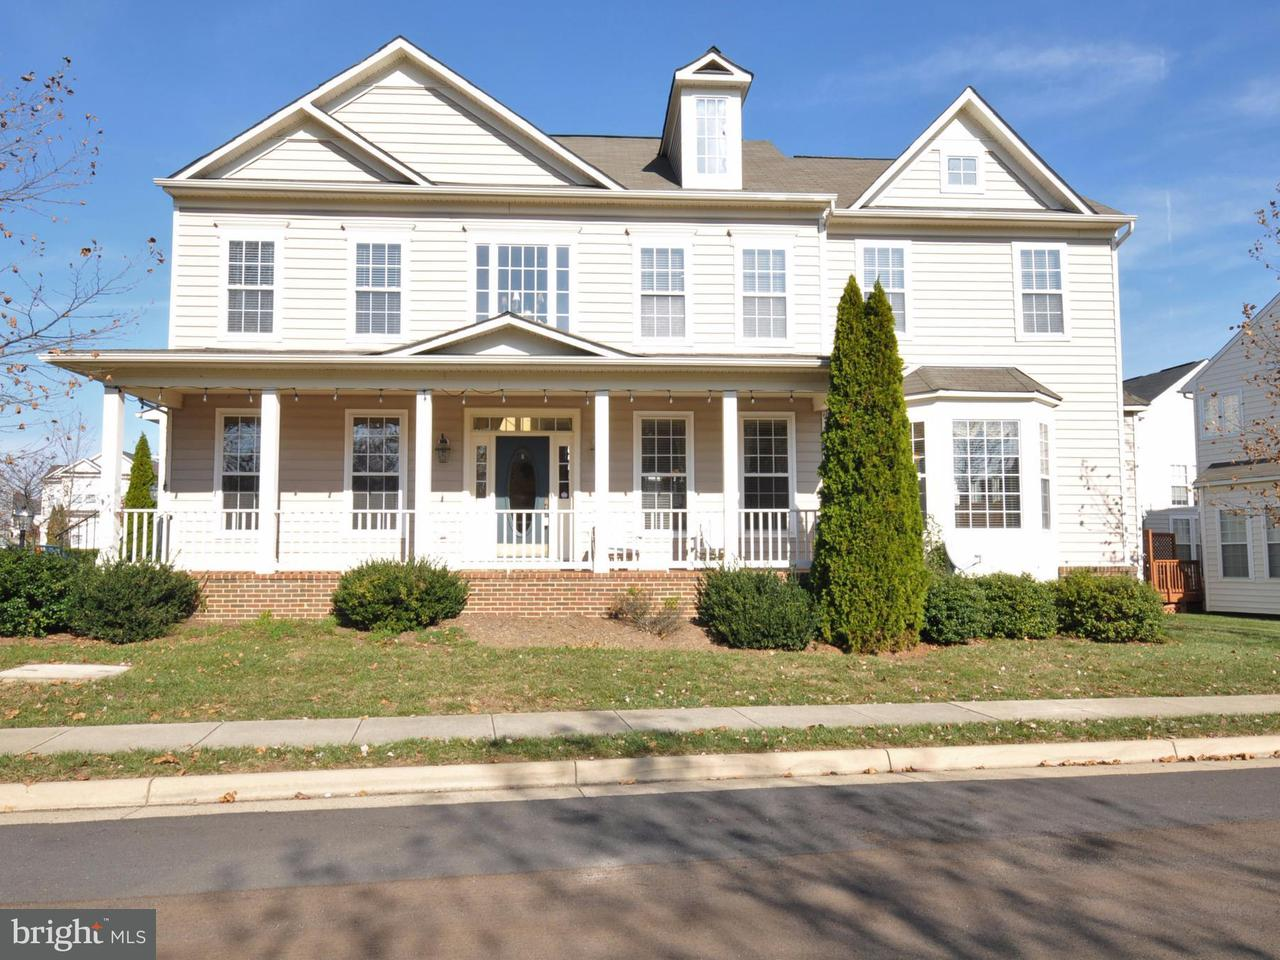 独户住宅 为 销售 在 43206 ARBOR GREENE WAY 43206 ARBOR GREENE WAY Broadlands, 弗吉尼亚州 20148 美国